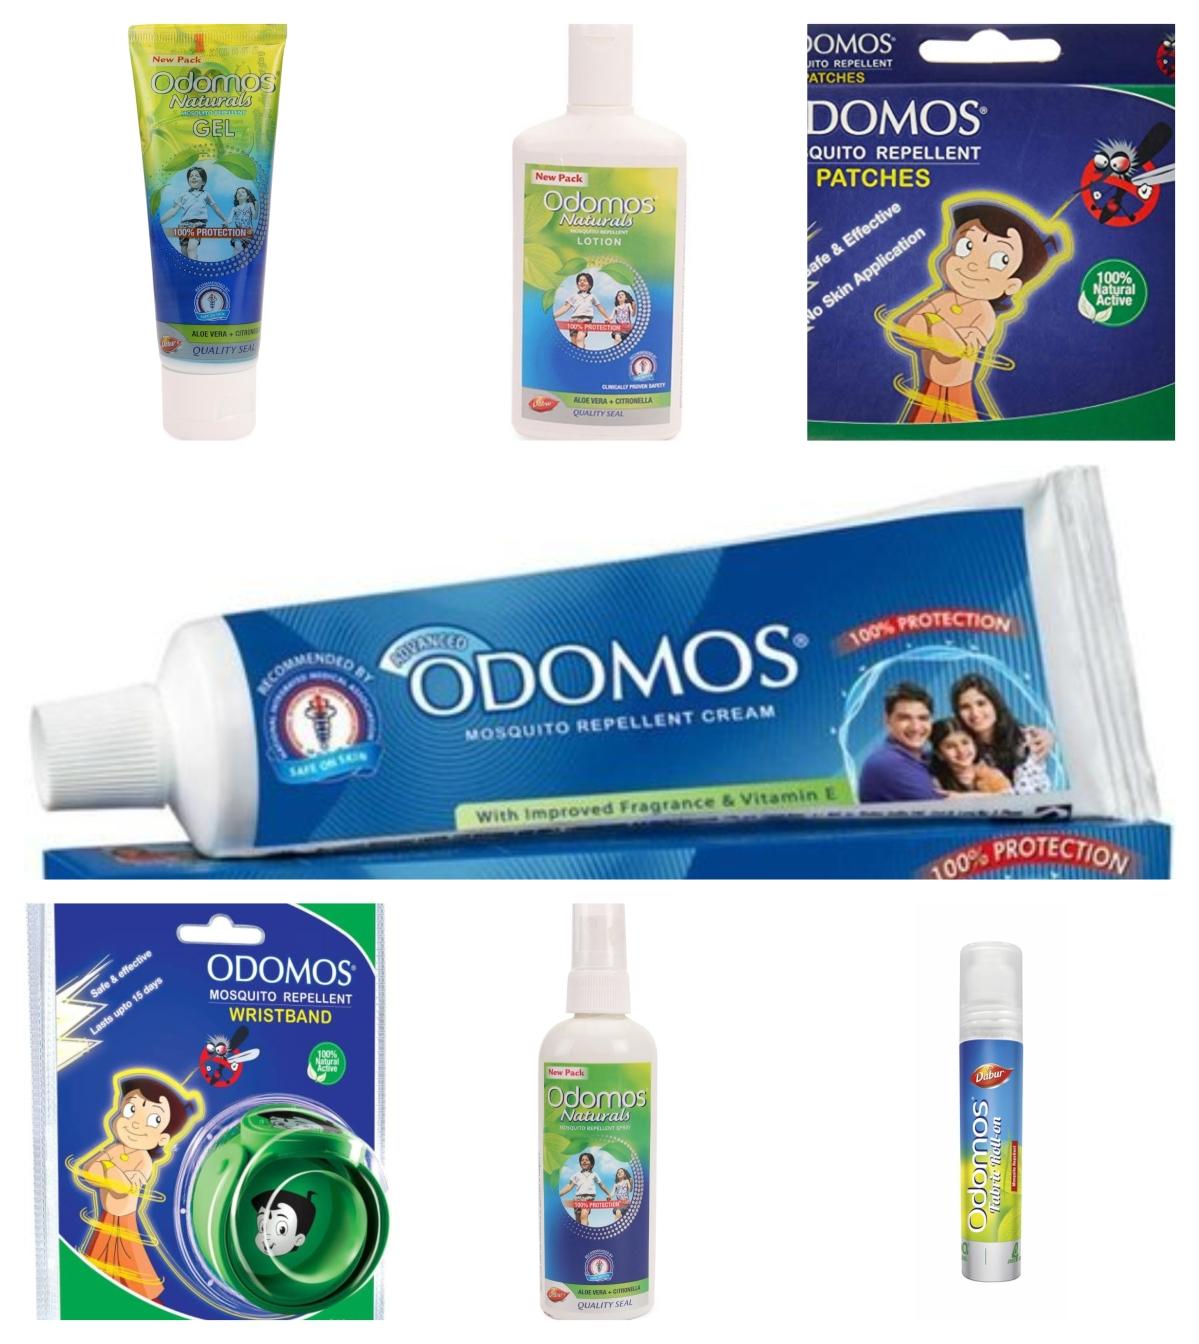 Different formats of Dabur Odomos